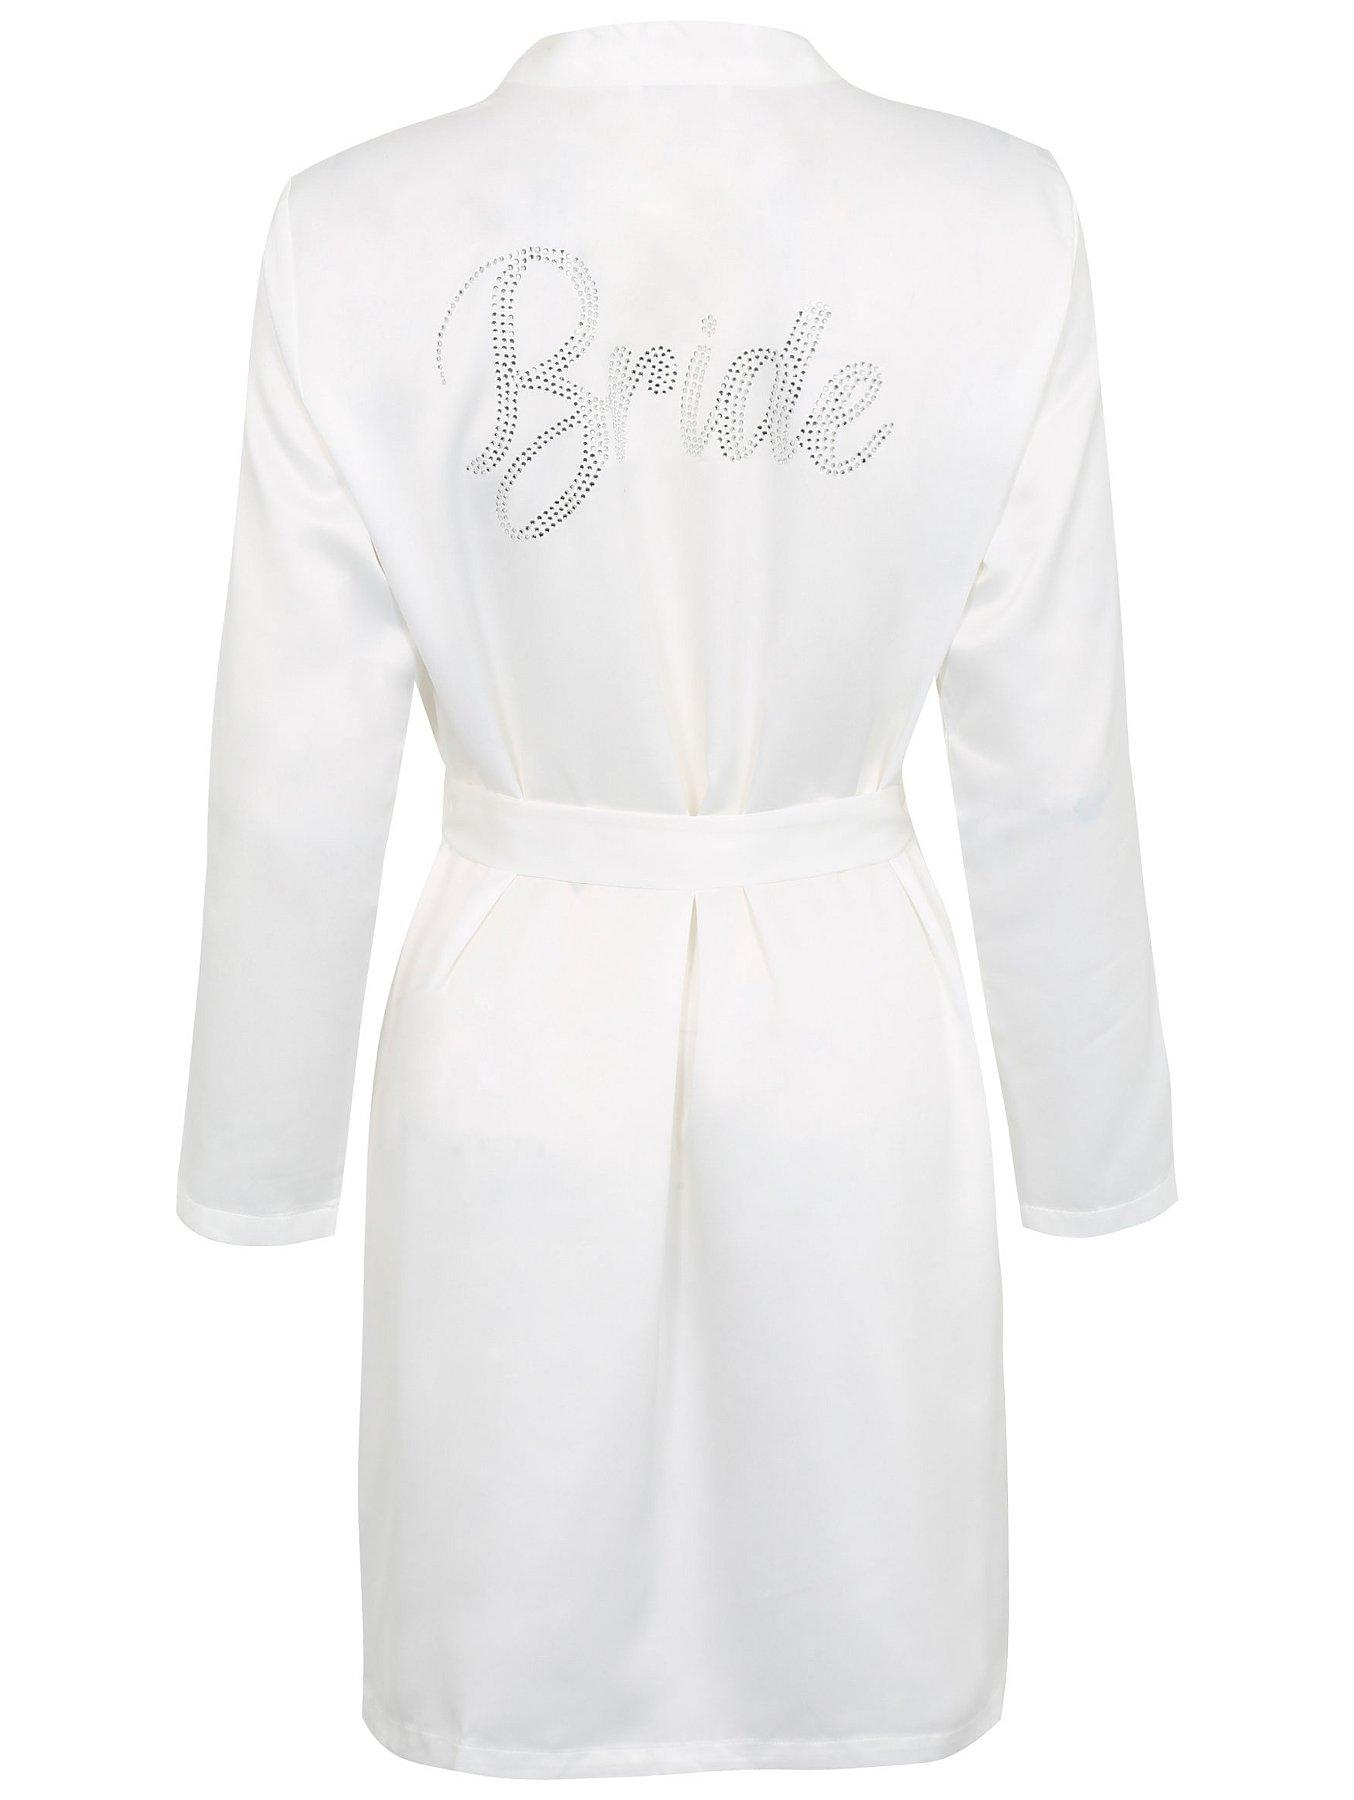 Diamante Bride Dressing Gown Women George